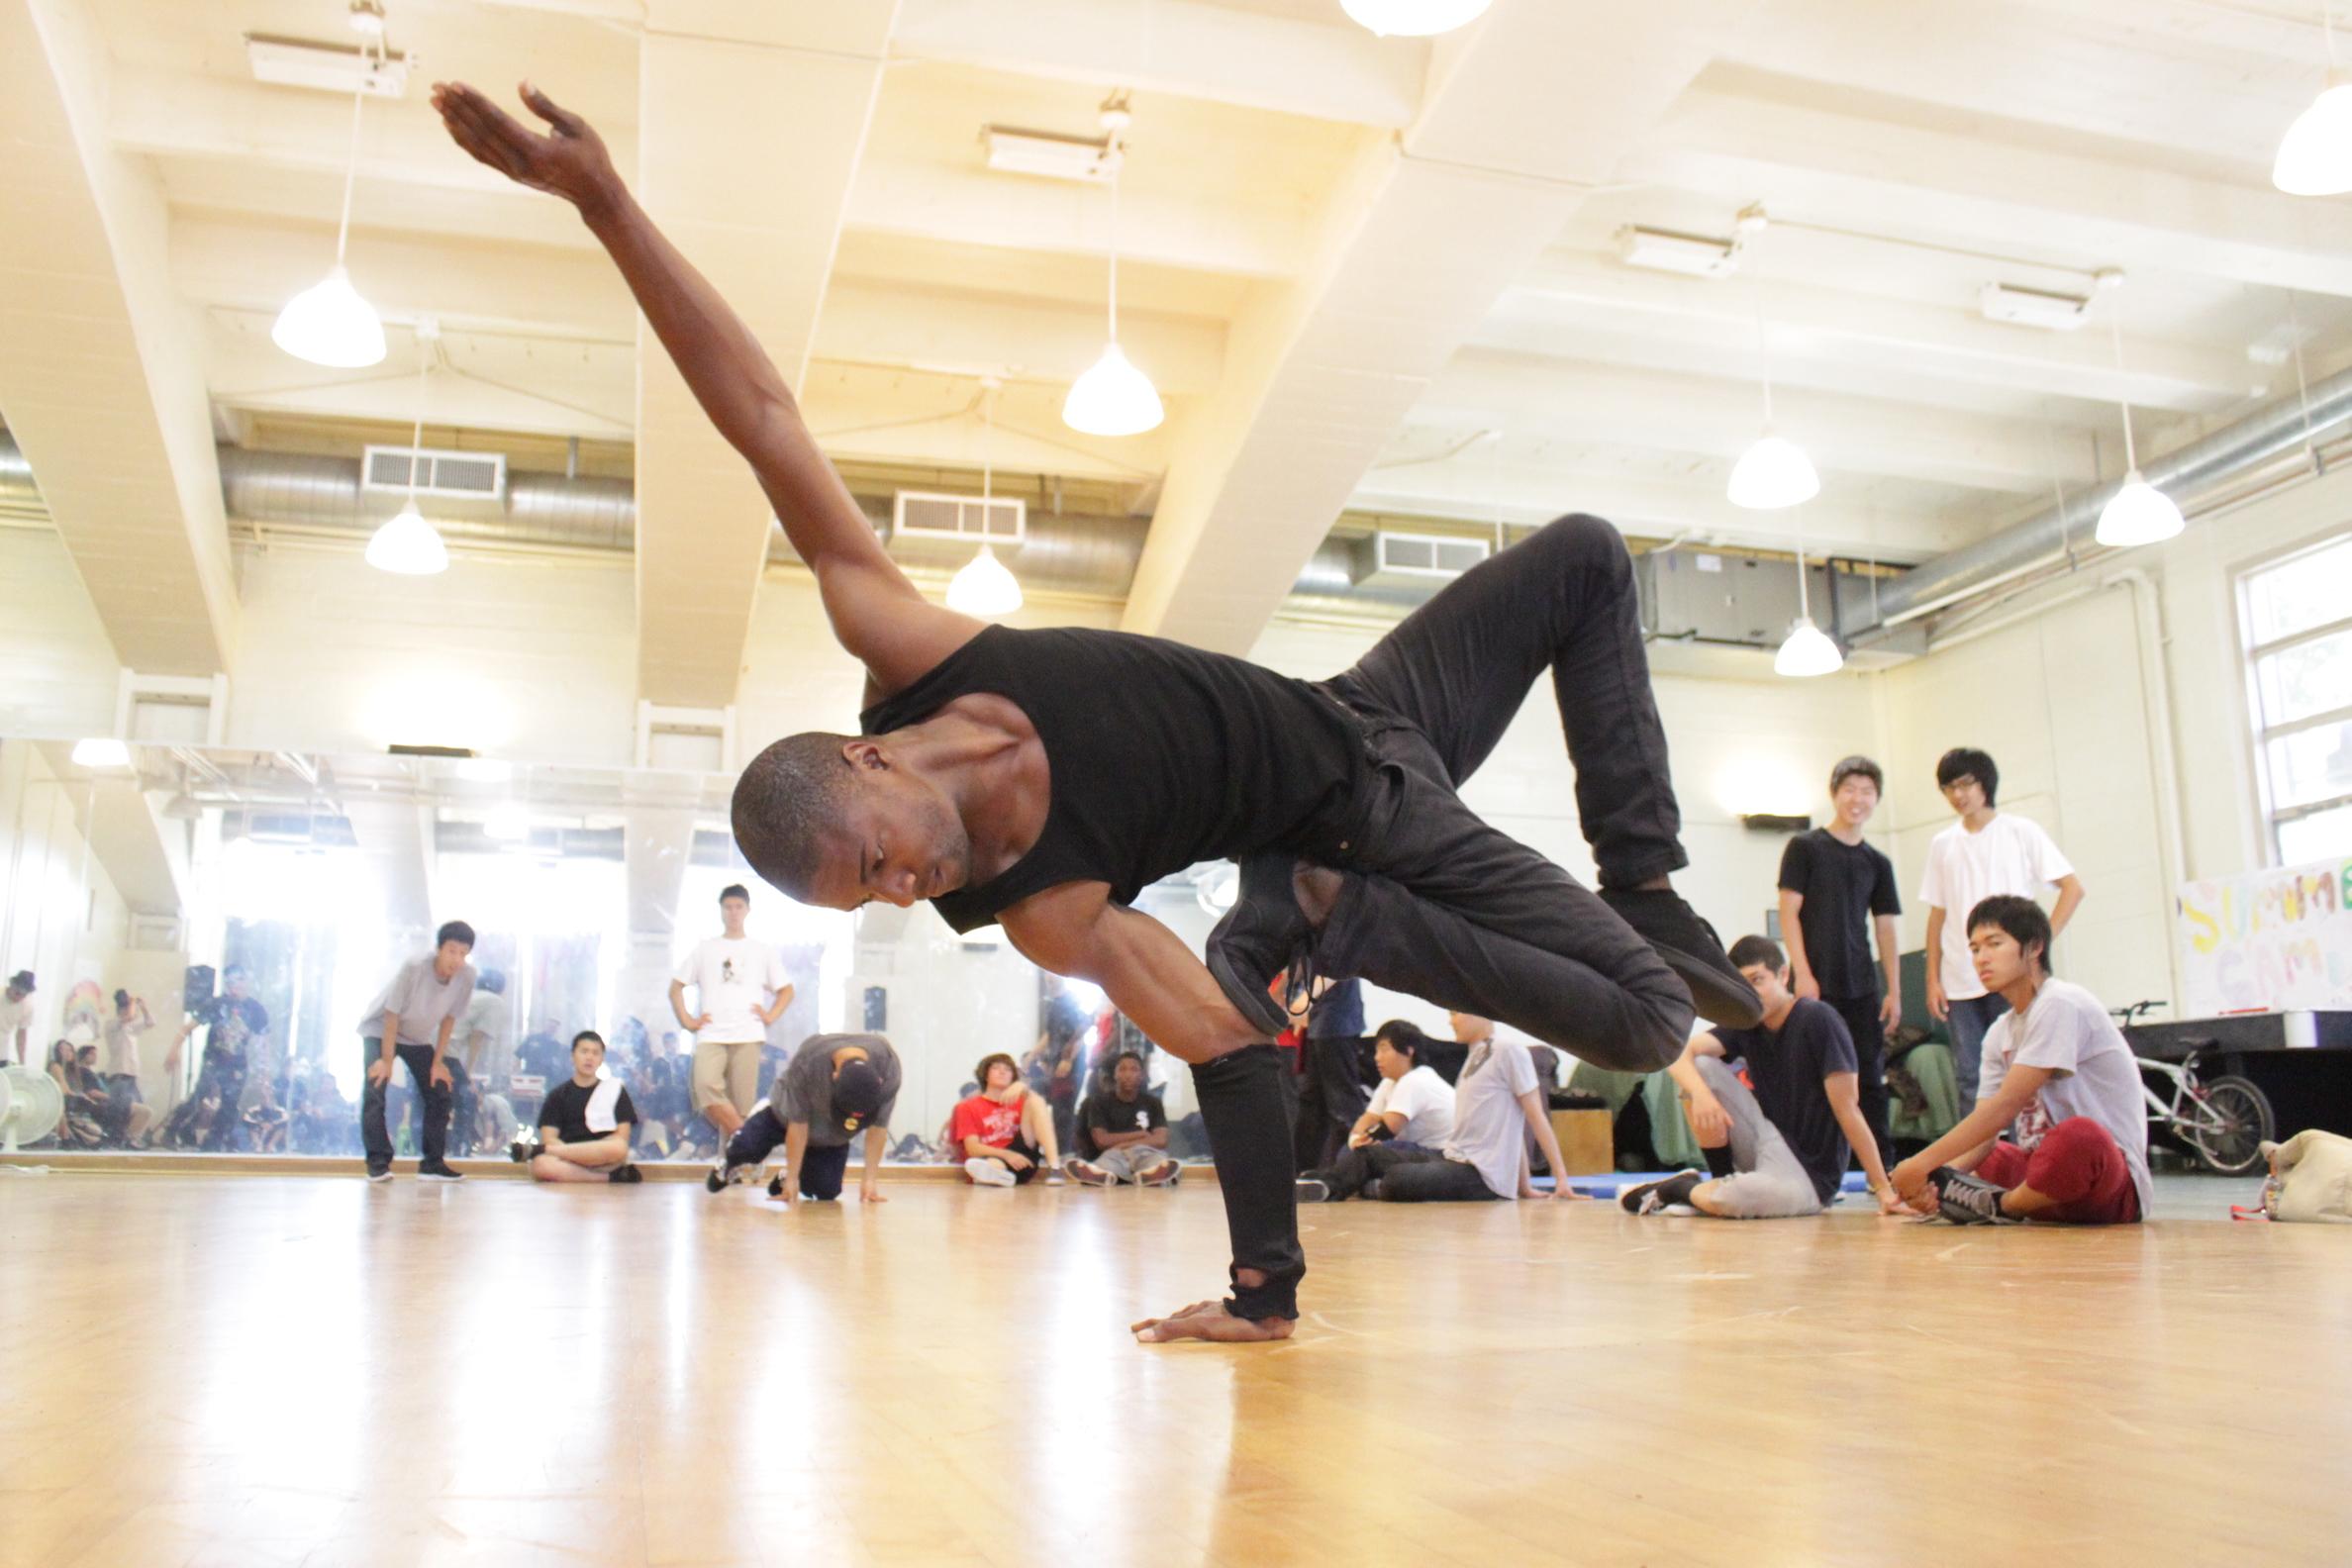 JUiCE Los Angeles Hip Hop Nonprofit Breakdance Music Art Community Youth Breakdance Los Angeles Freeze Bboy Breaking Hip hop.JPG